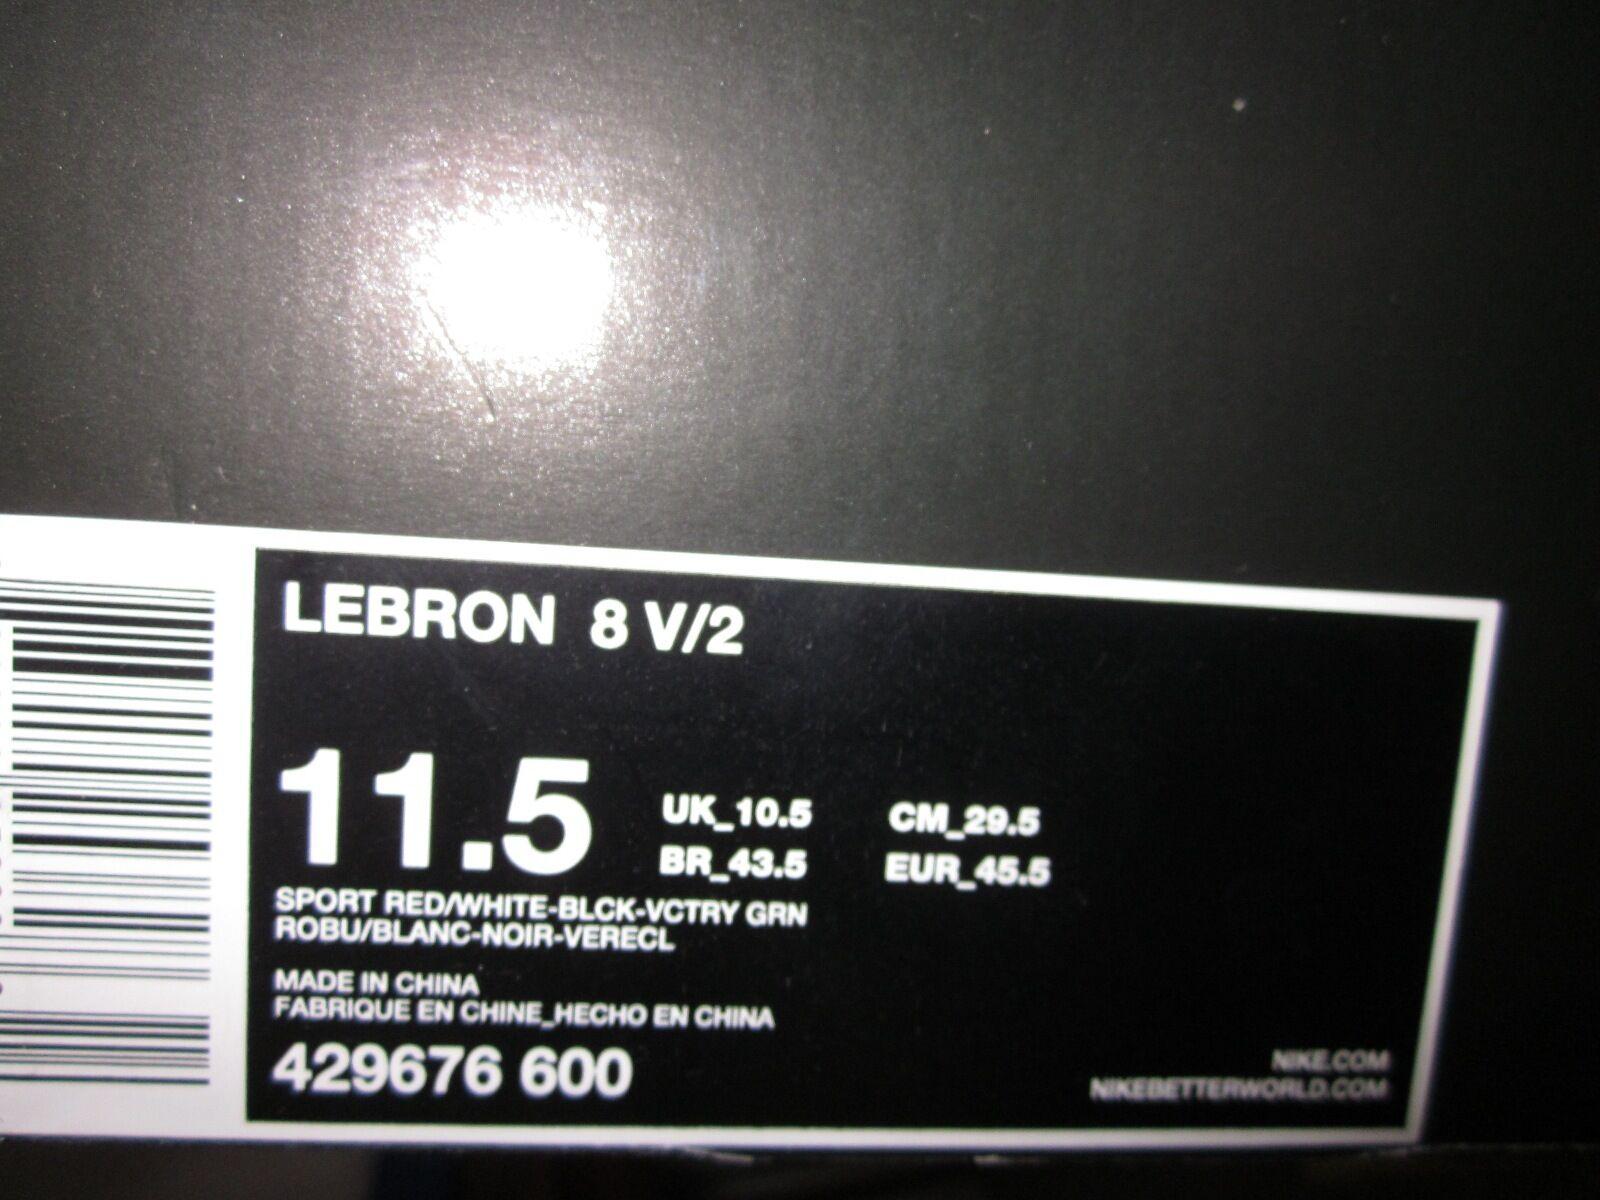 NIKE 2018 LEBRON 8 V/2 429676 600